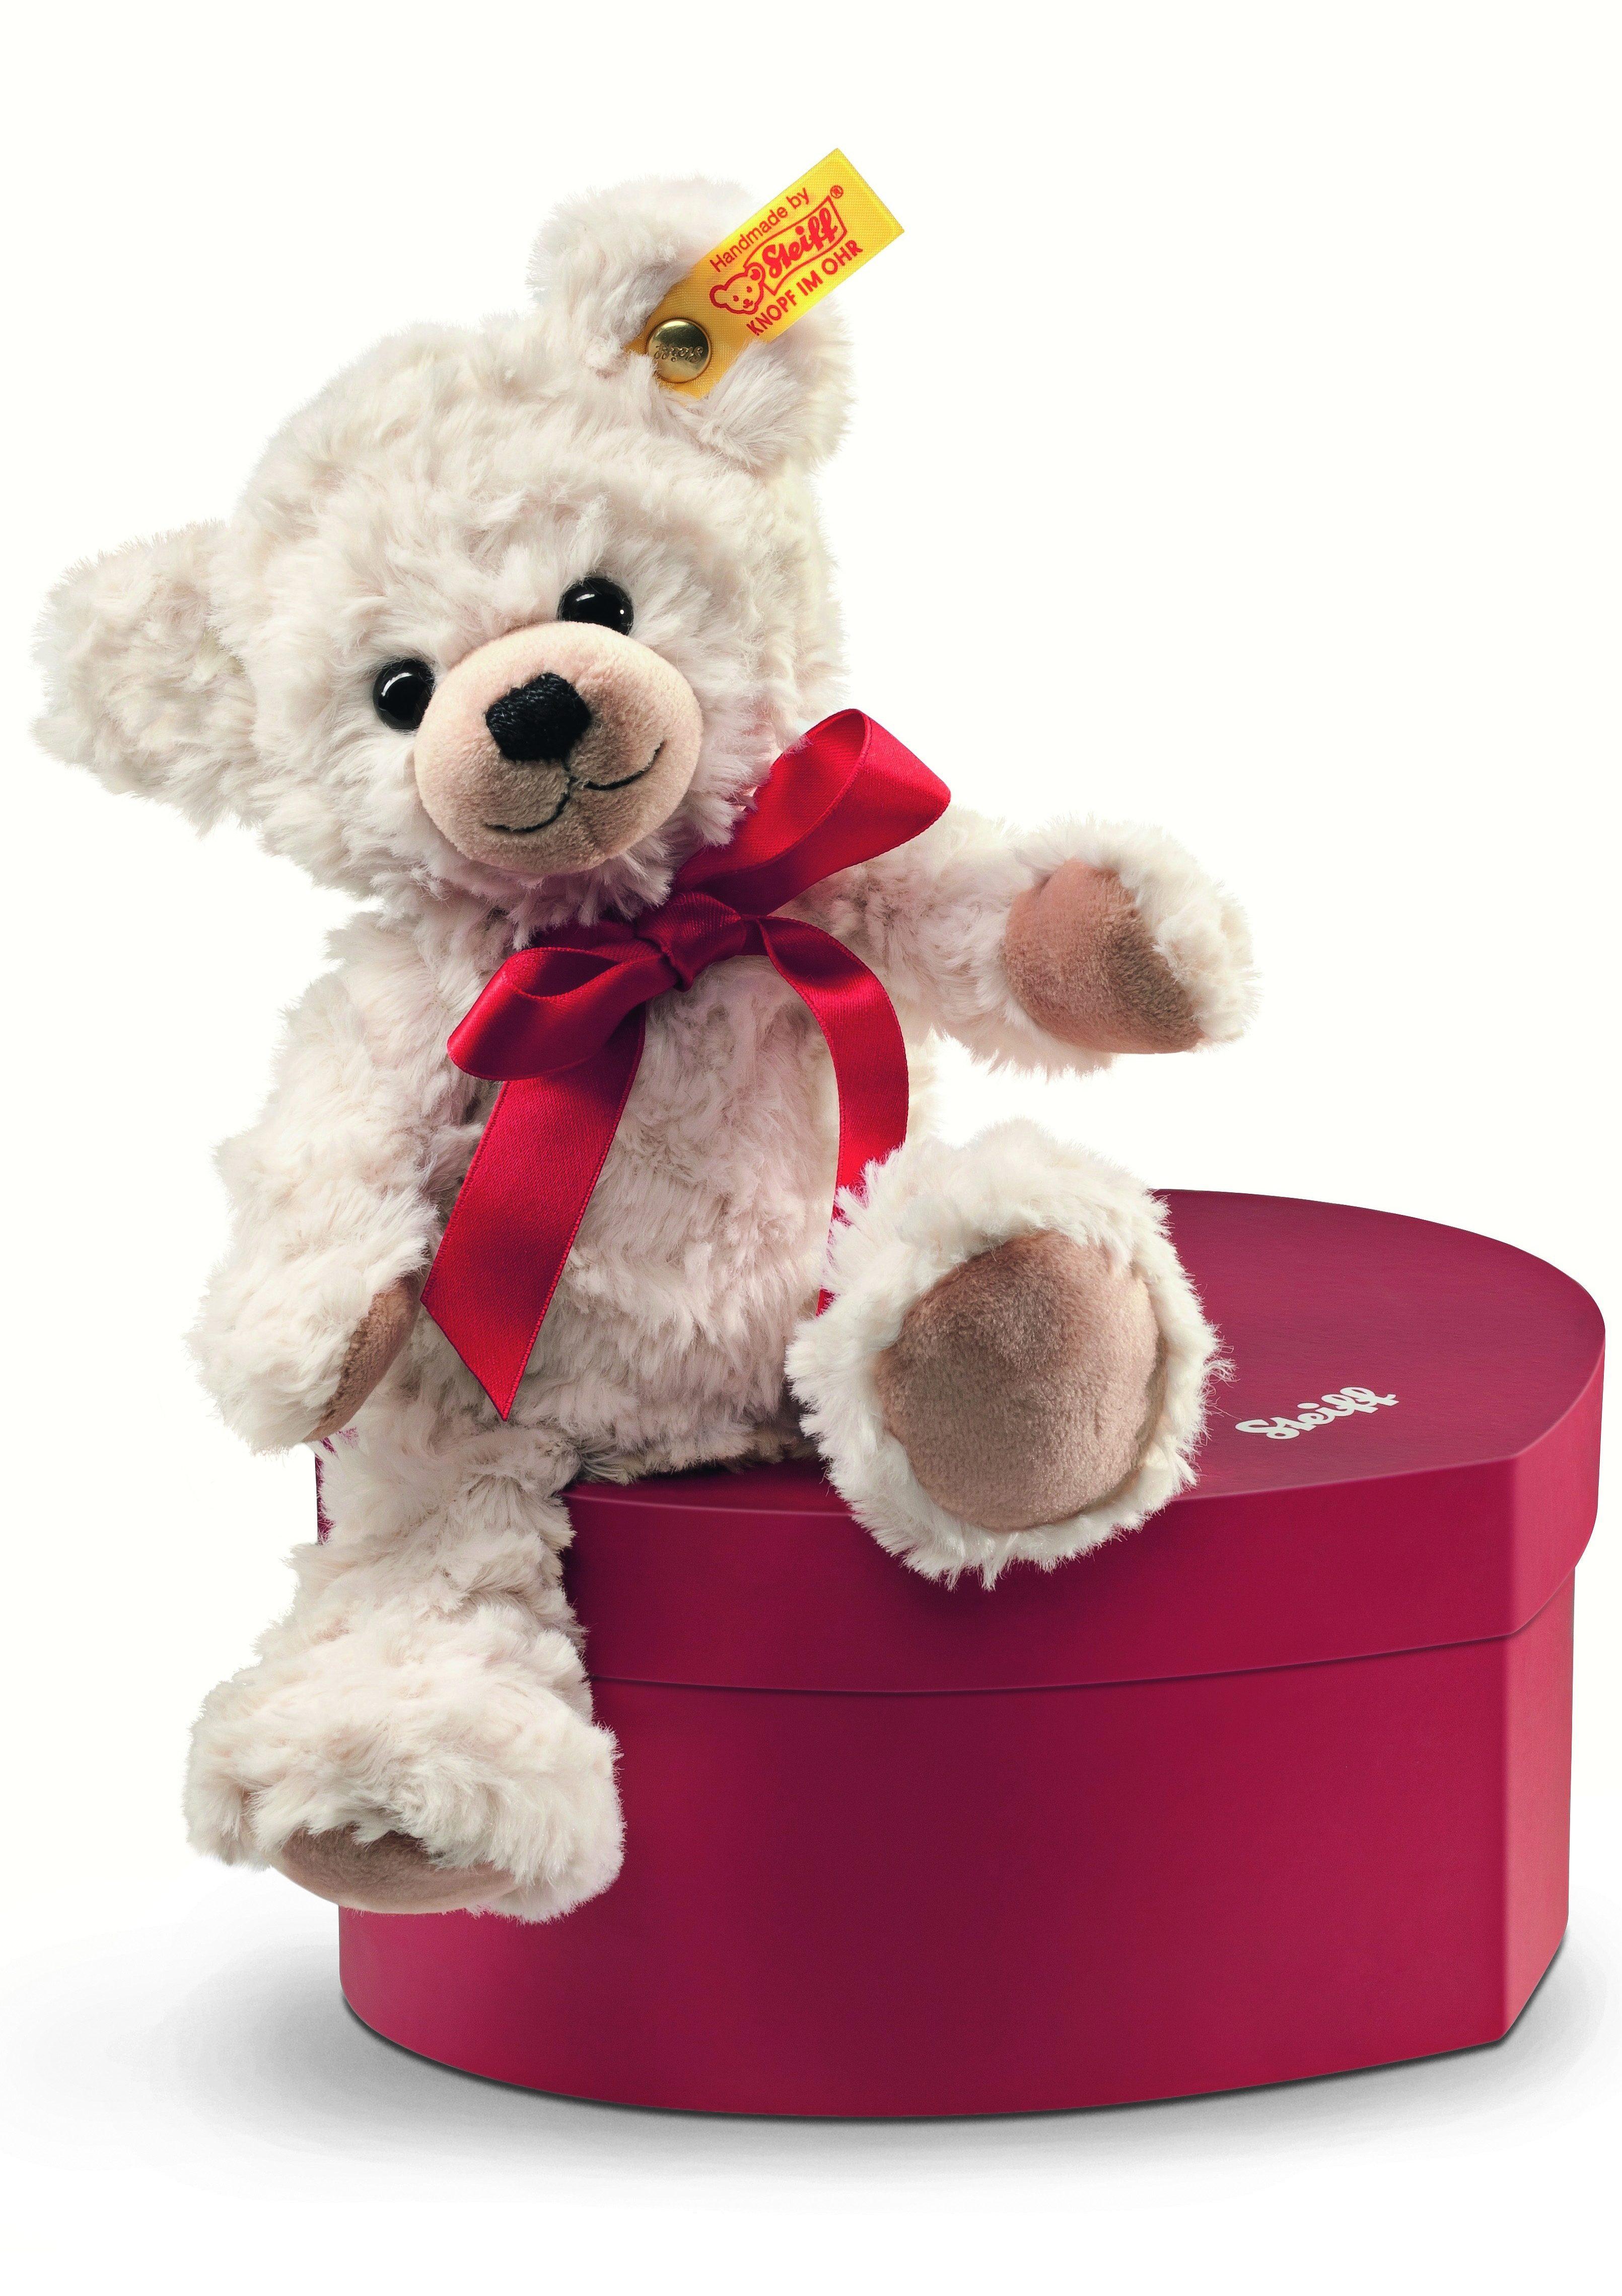 Steiff Plüschtier, »Sweetheart Teddybär in Herzbox«